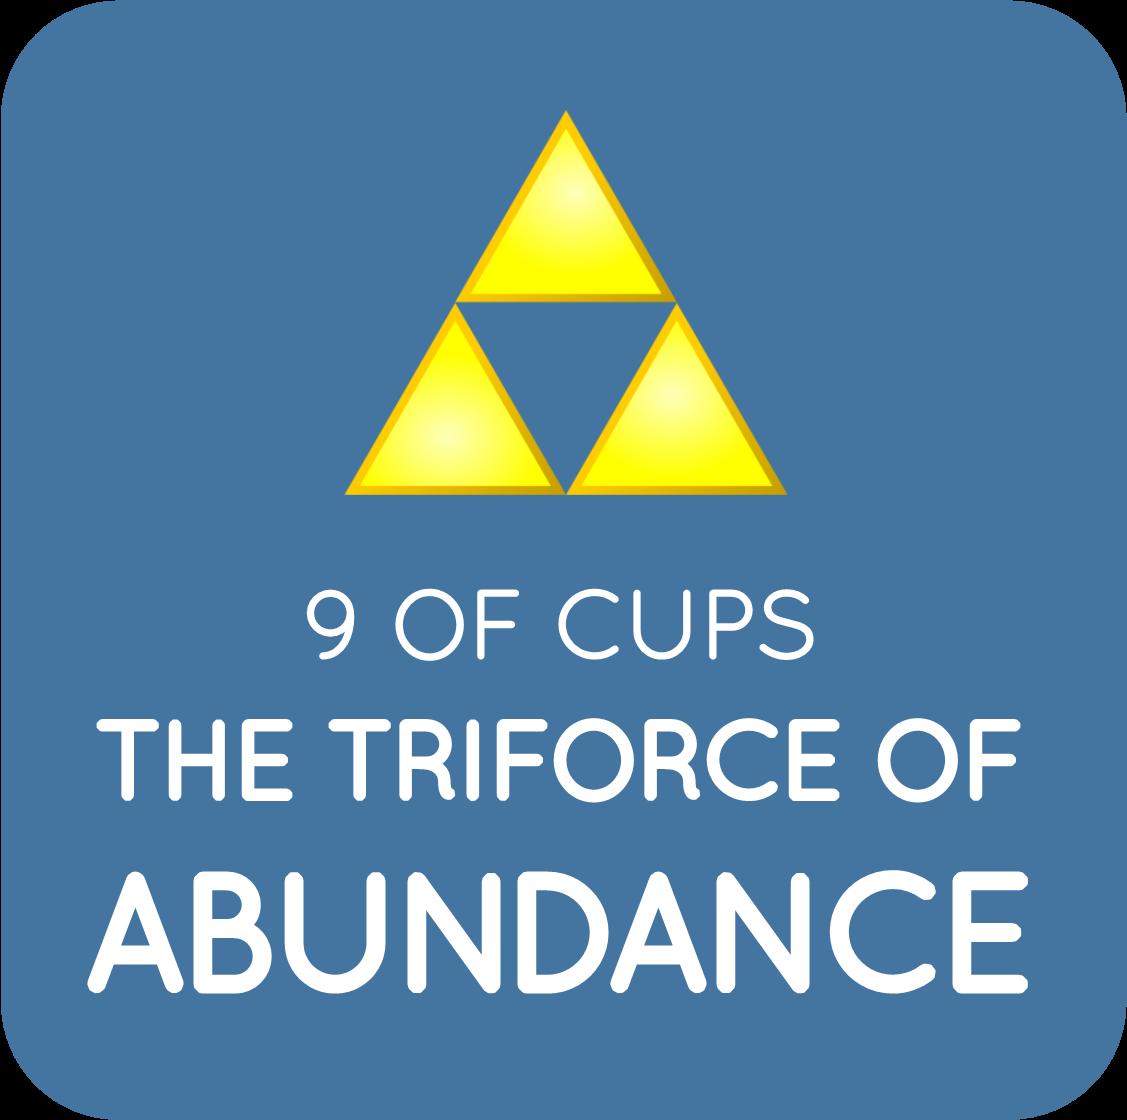 01-Triforce of abundance.png